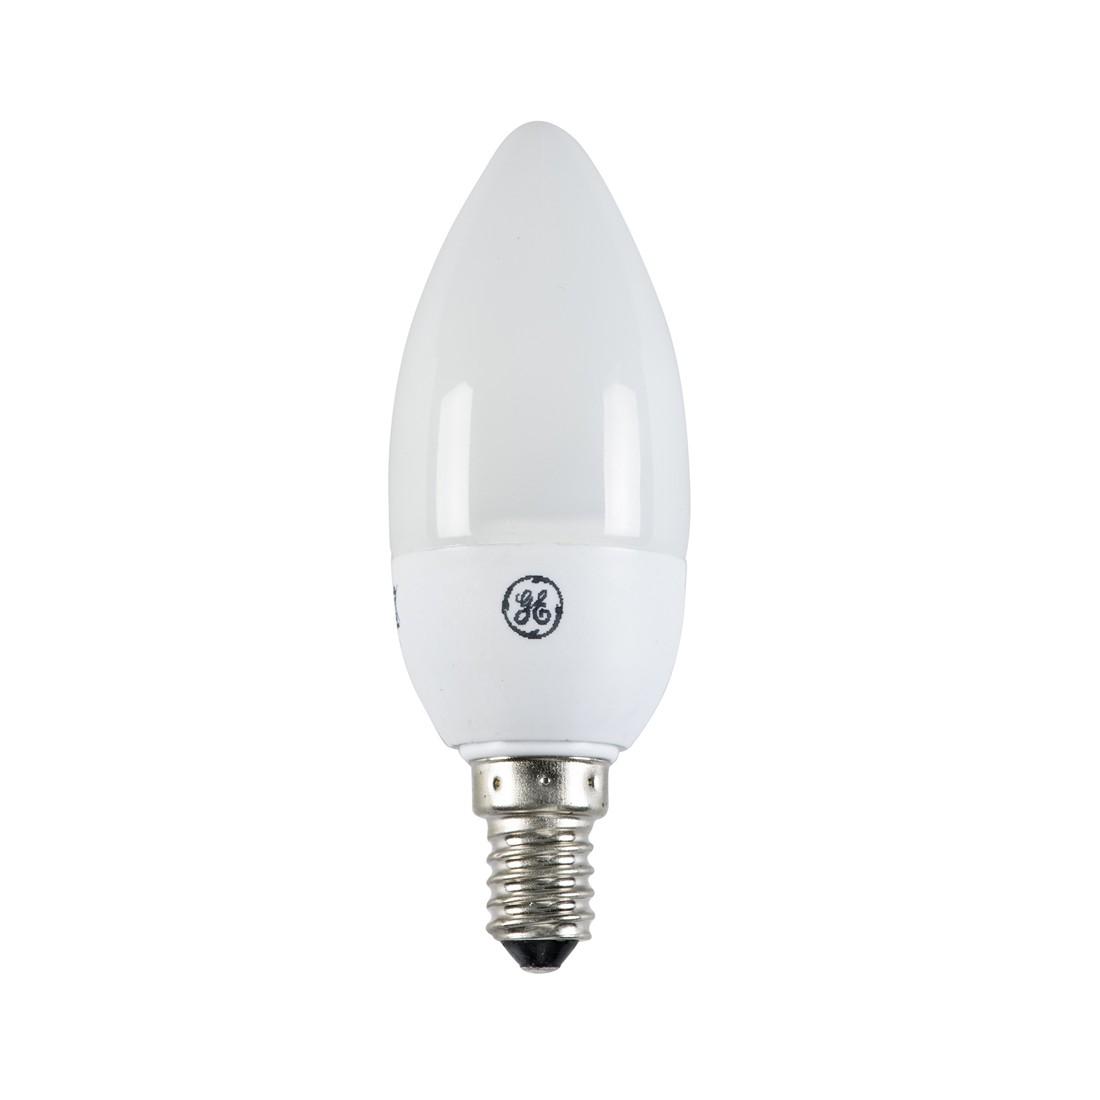 Energiesparlampe E14 7 W Kerze ● Glas Weiß- GE Lighting